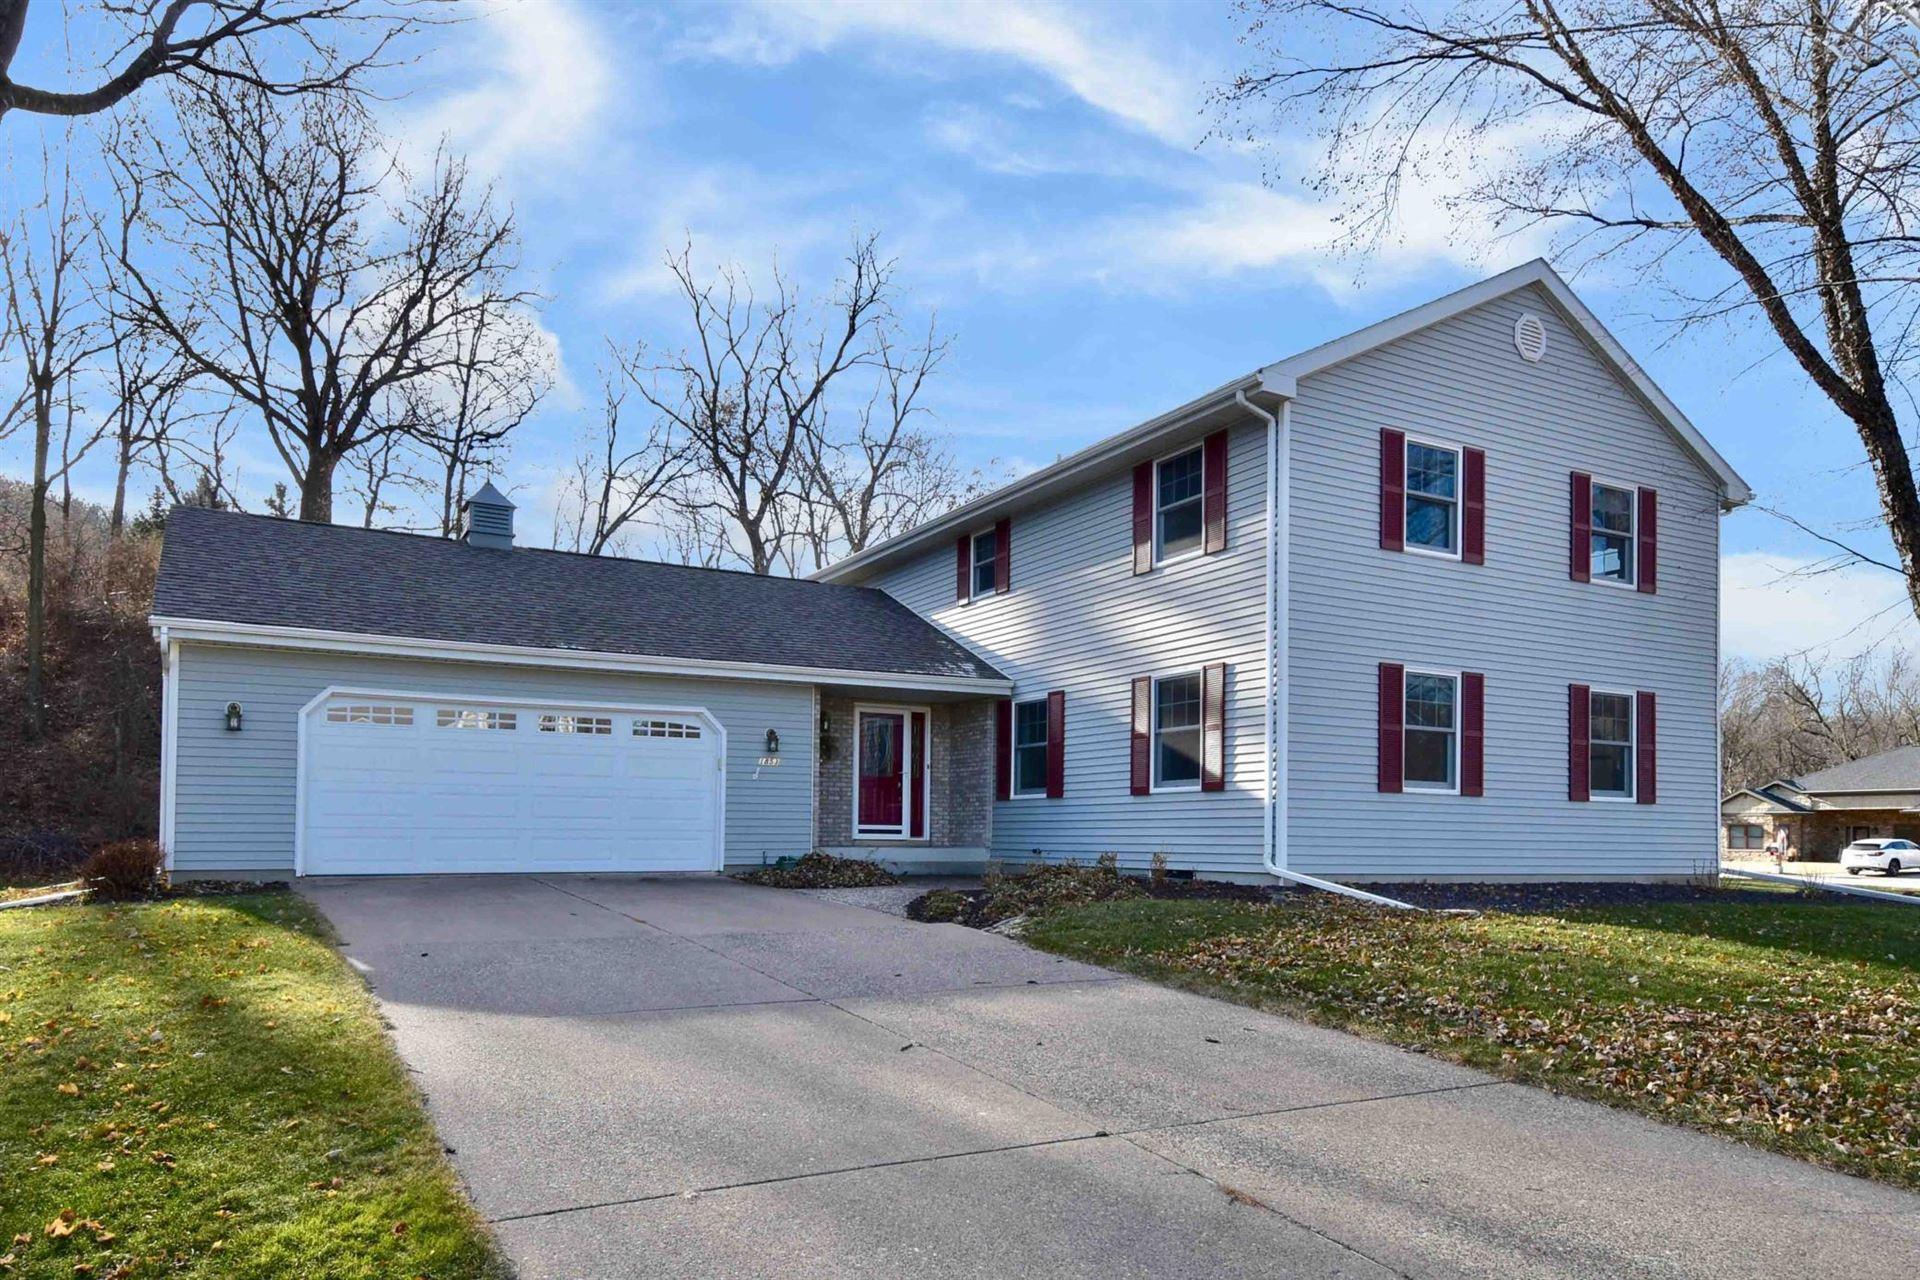 1853 Edgewood Road, Winona, MN 55987 - MLS#: 5693819